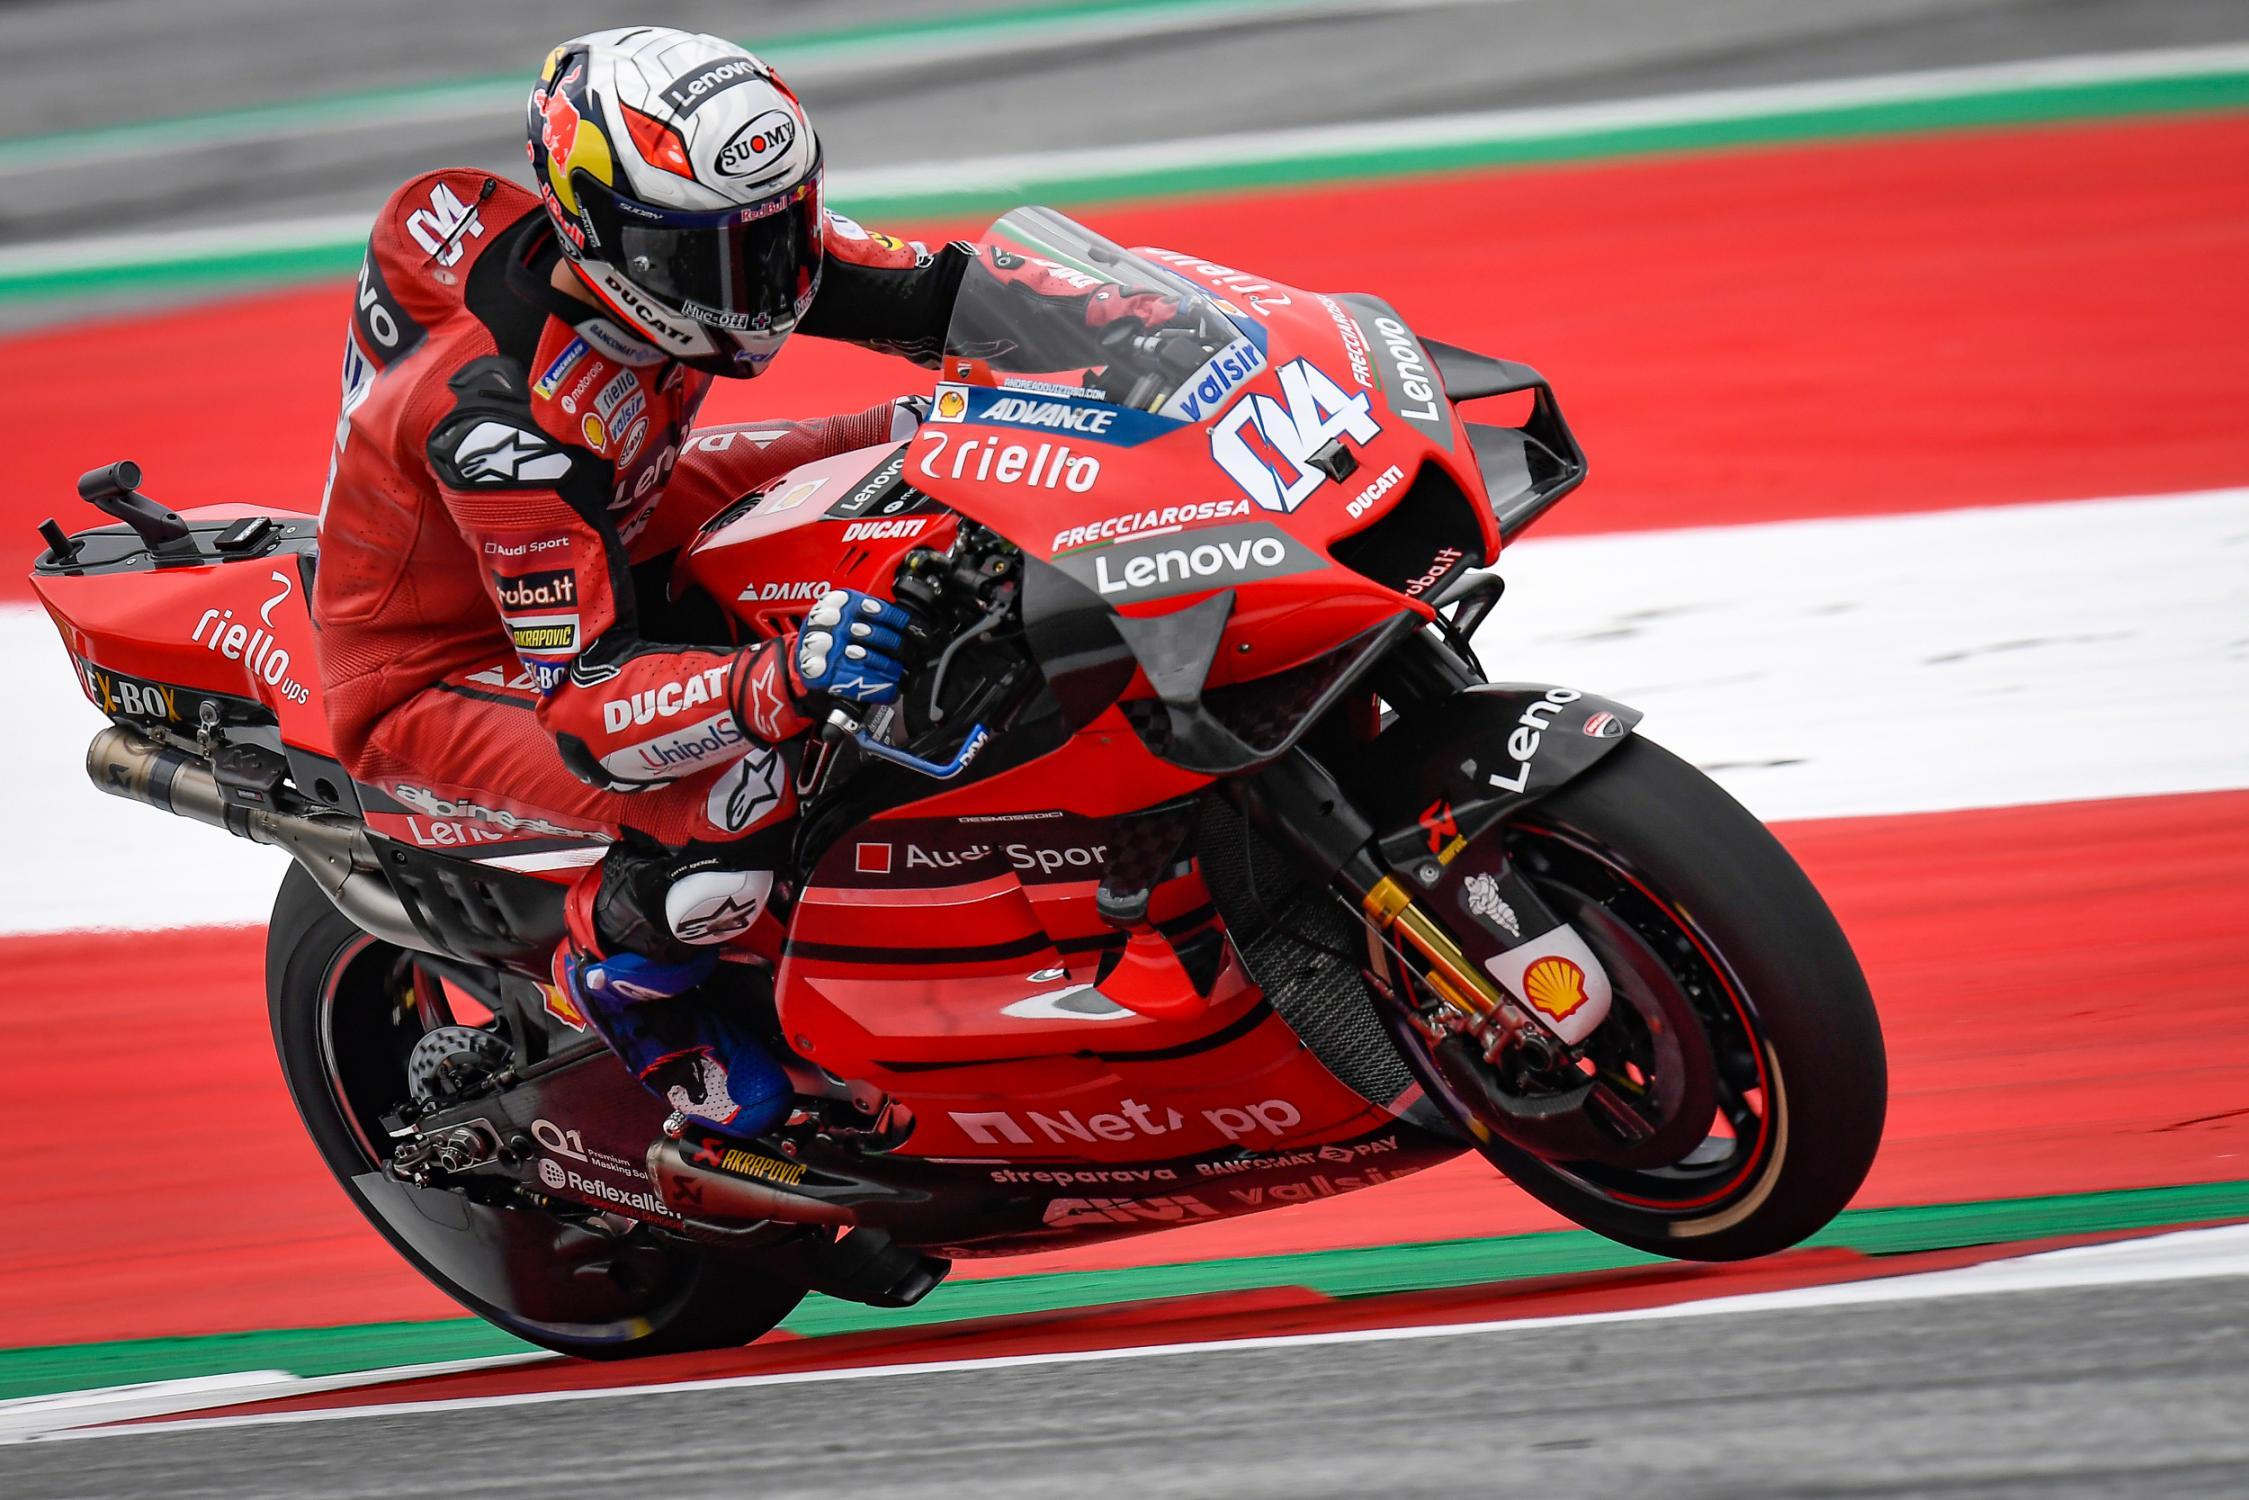 MotoGP, Dovizioso maintains his future in Ducati is in the hands of Gigi  Dall'Igna